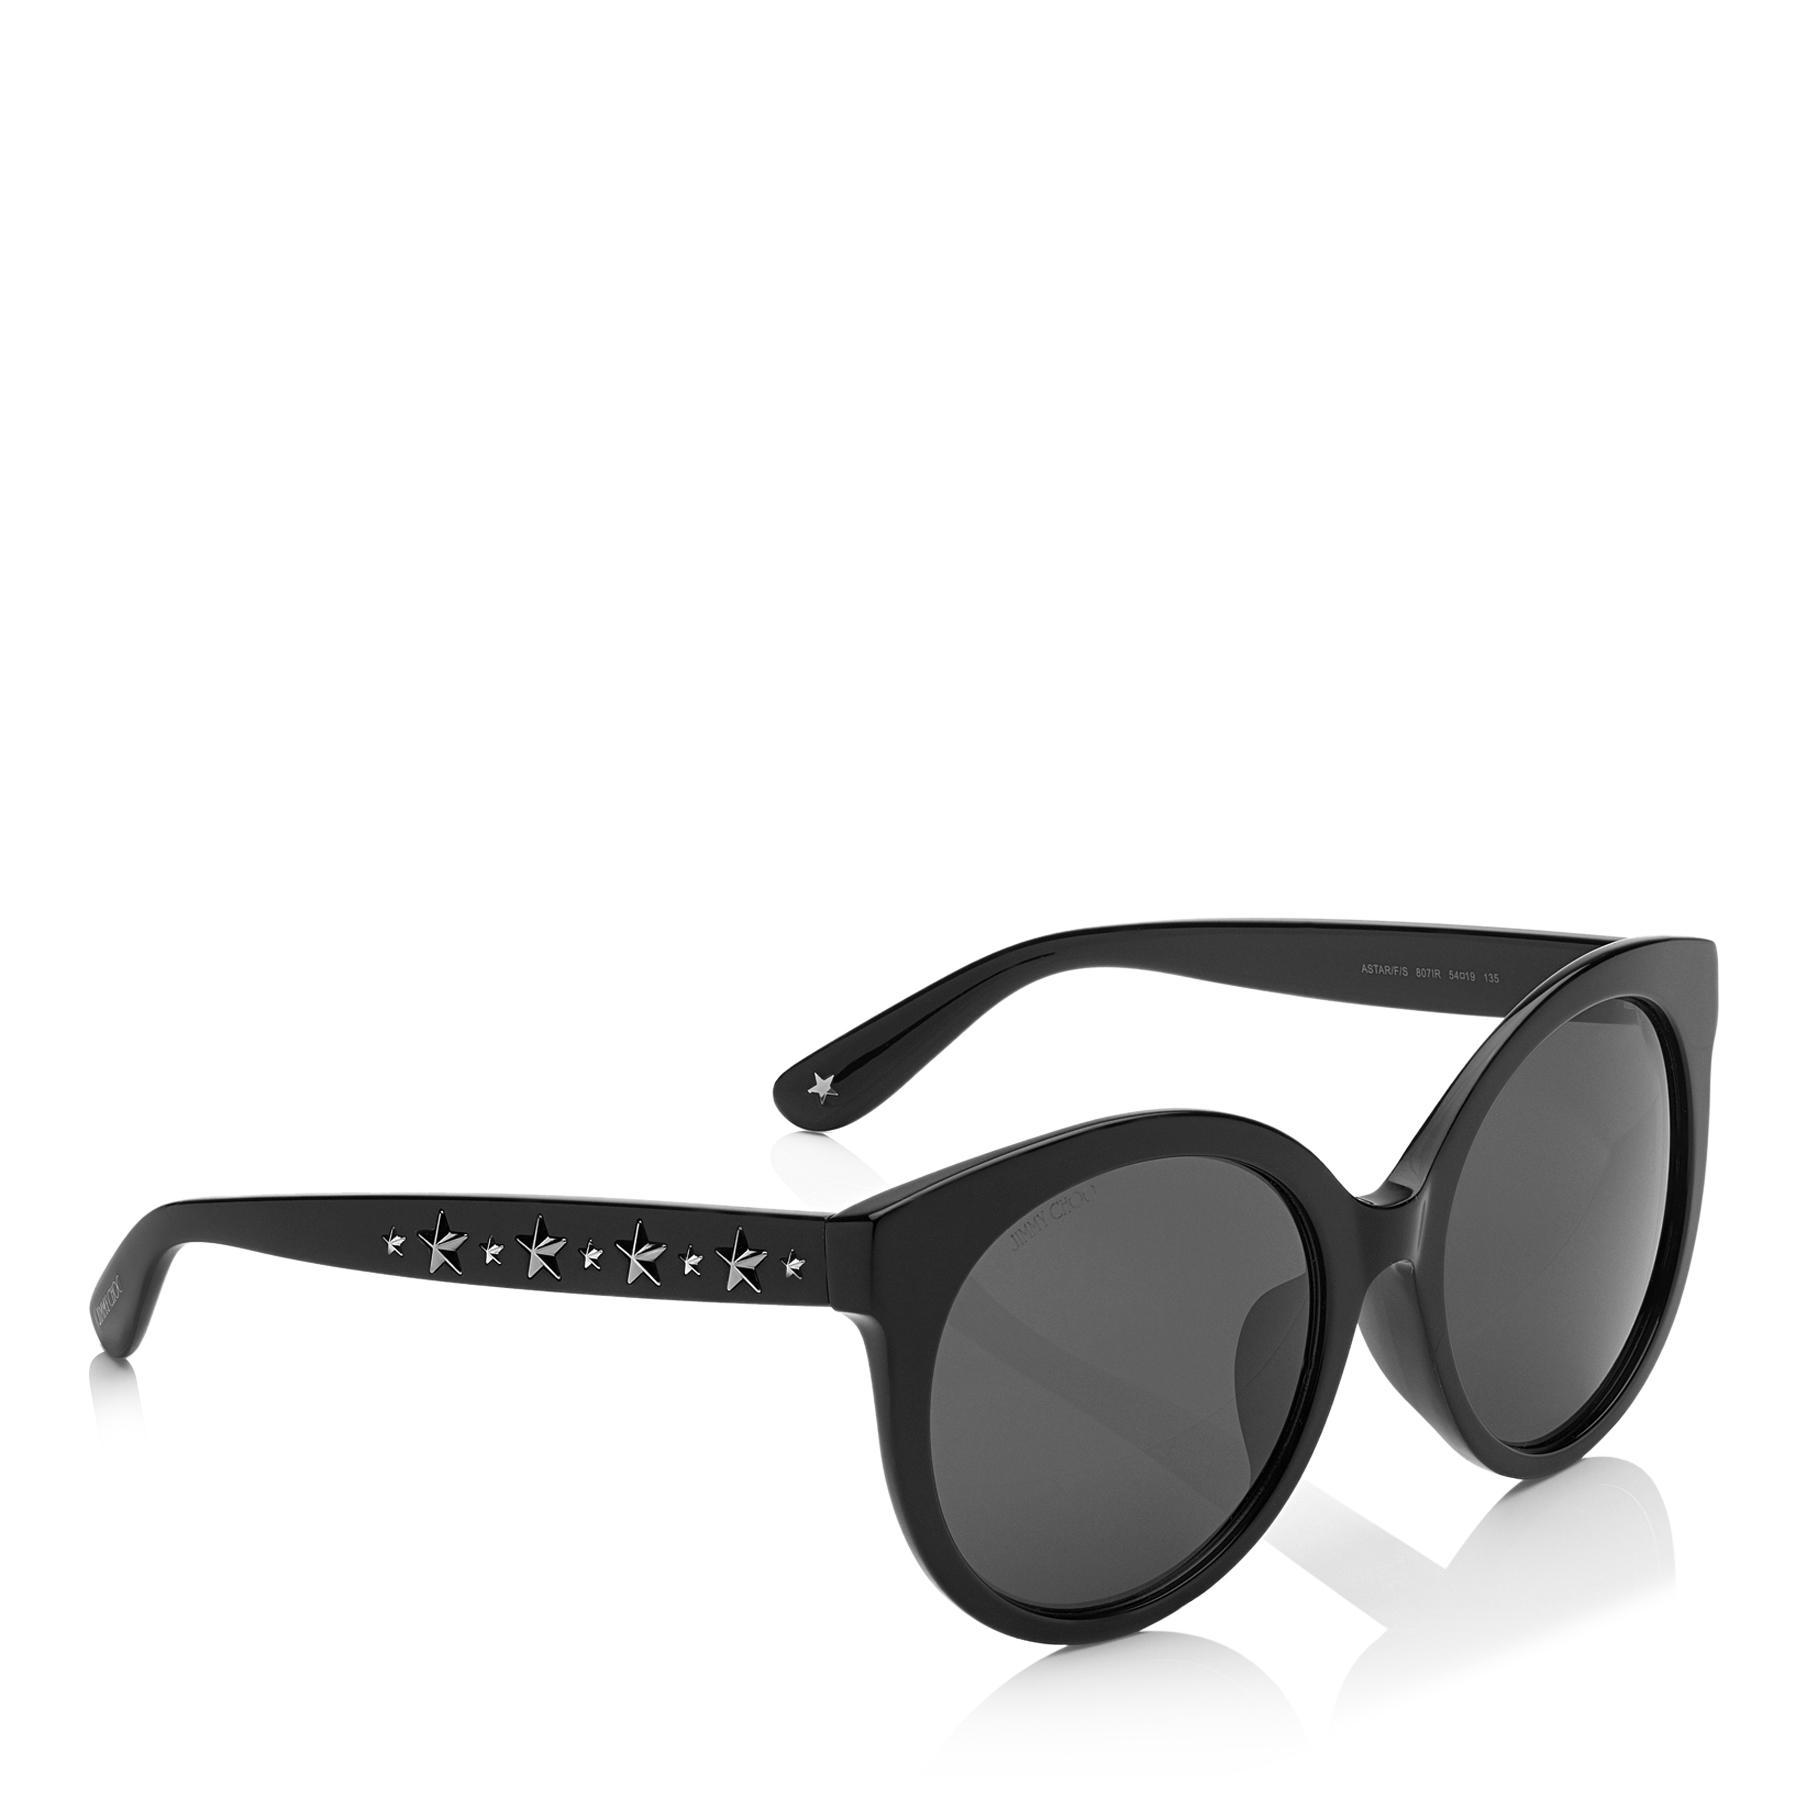 3a31982fc7 Jimmy Choo - Astar Black Oversized Sunglasses With Star Stud Detailing -  Lyst. View fullscreen